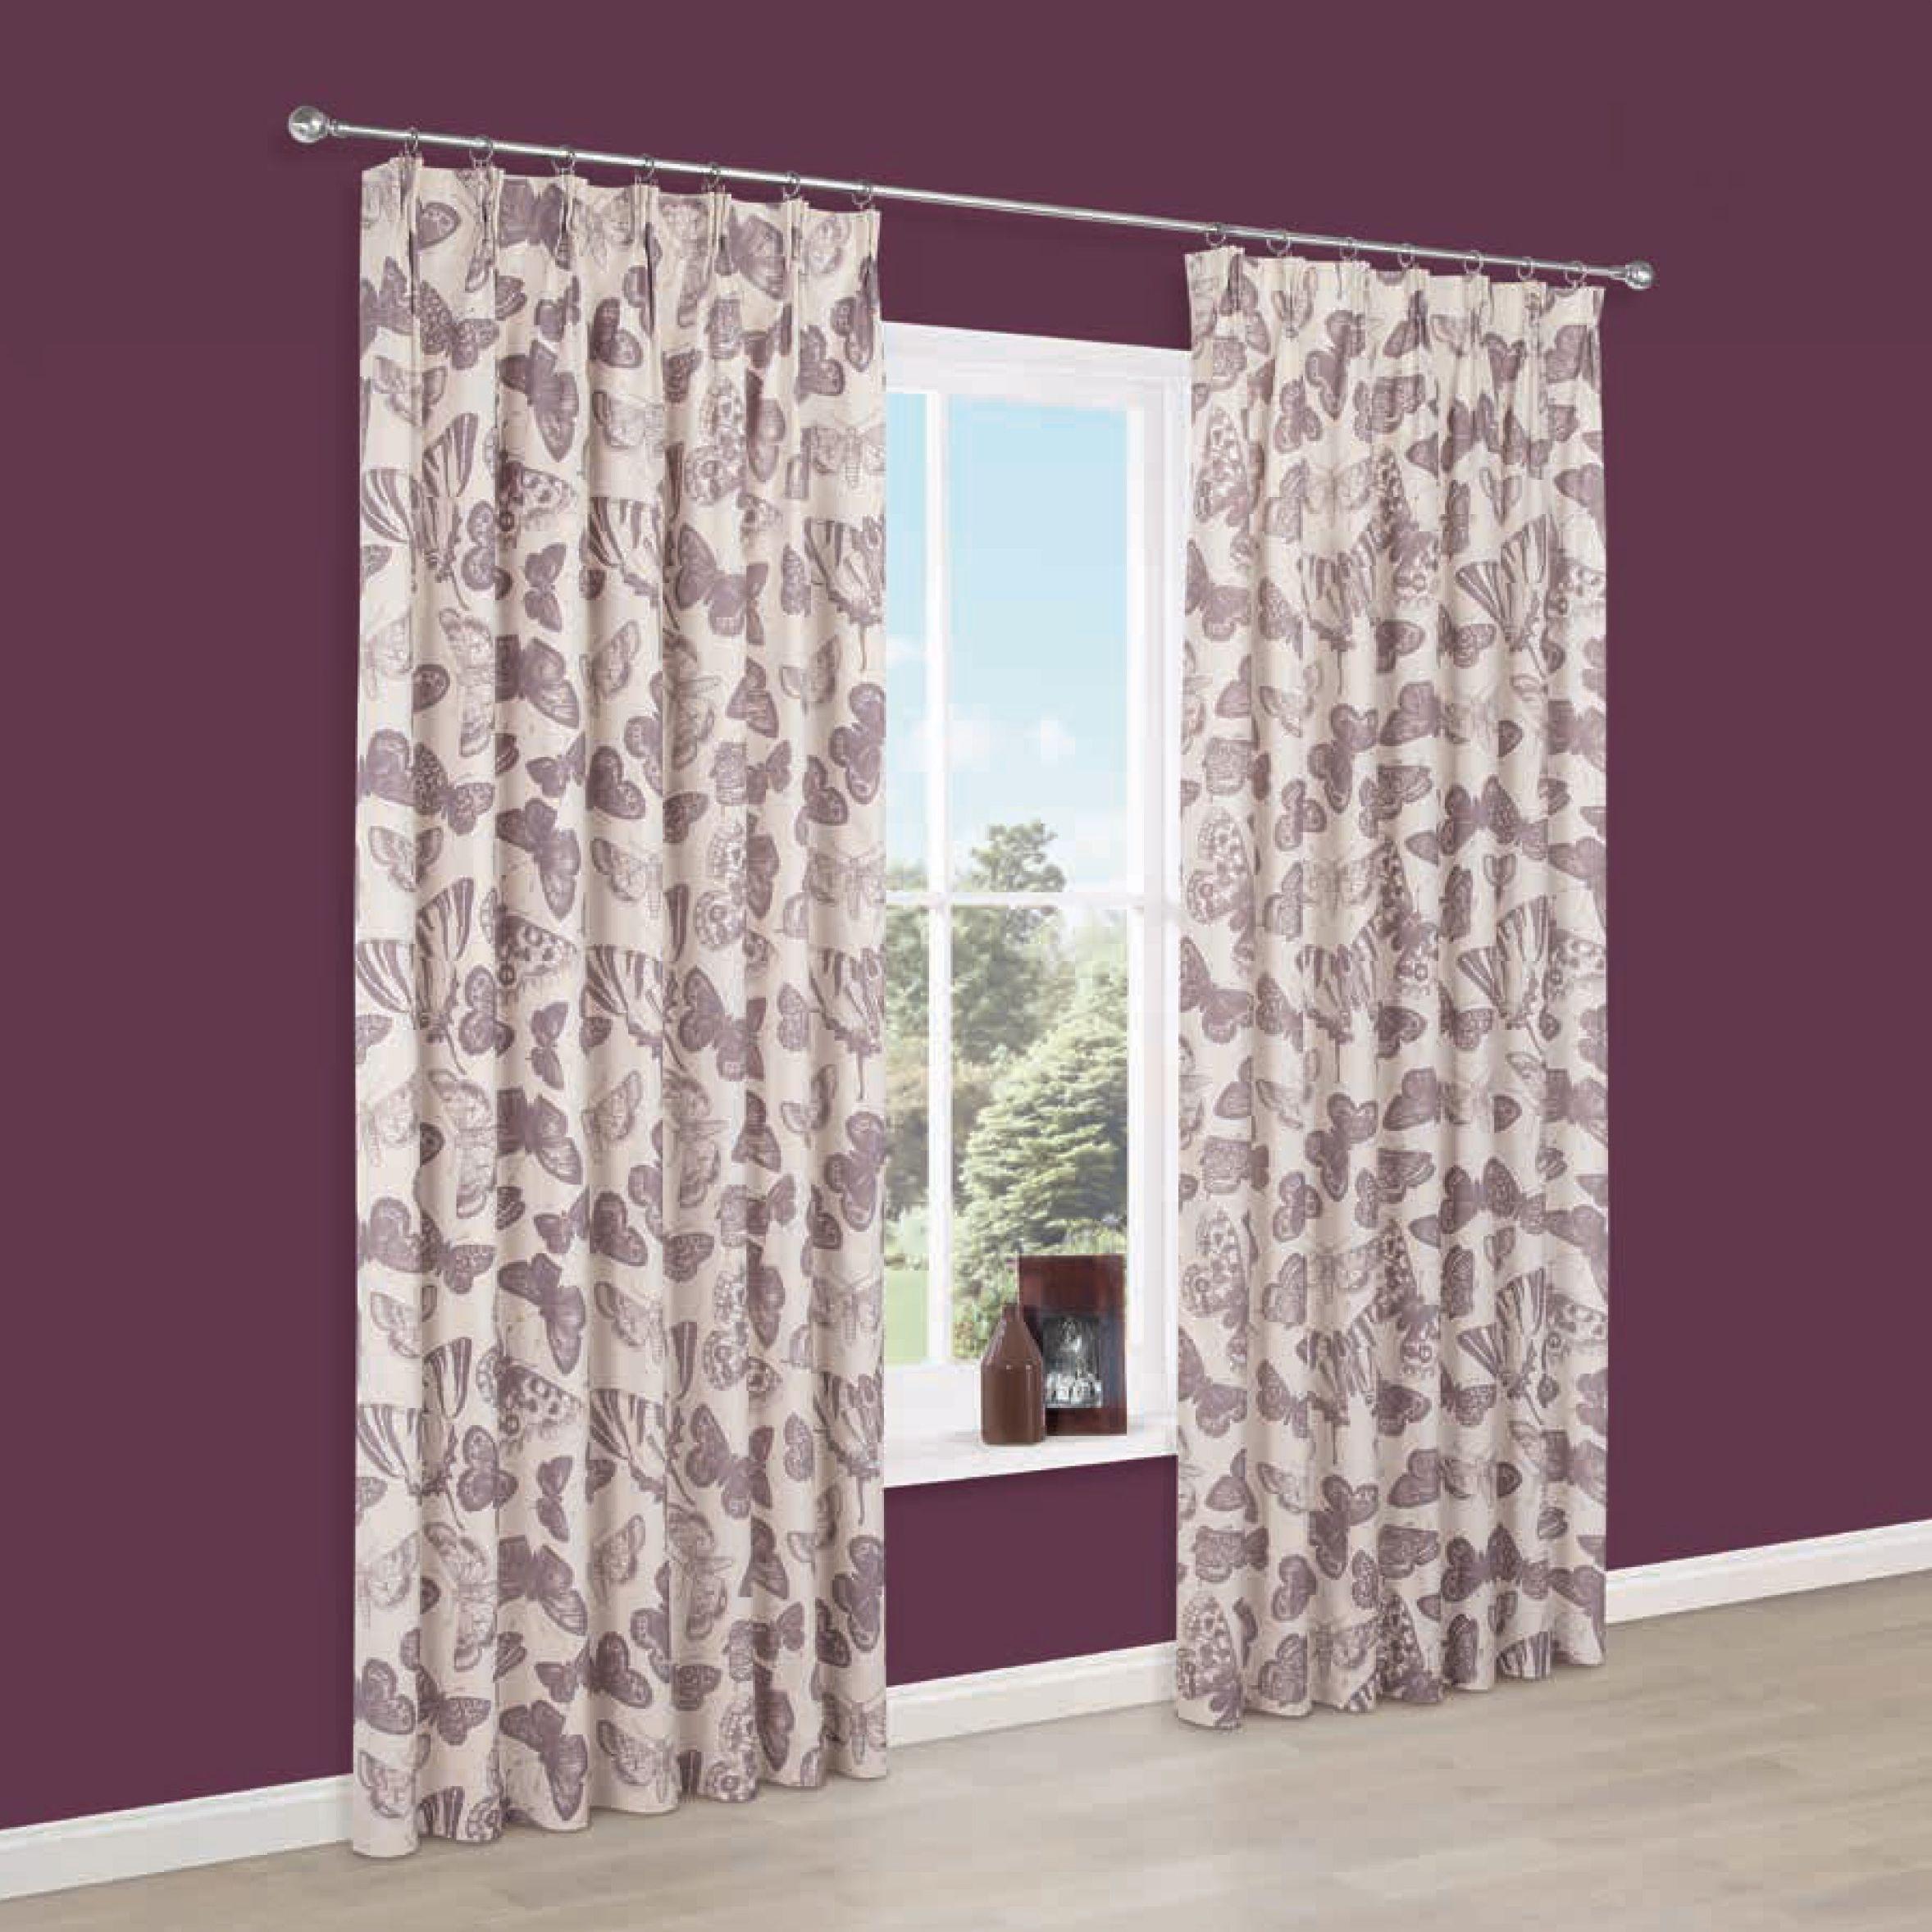 Dustine Cream Purple Erfly Pencil Pleat Lined Curtains W 117